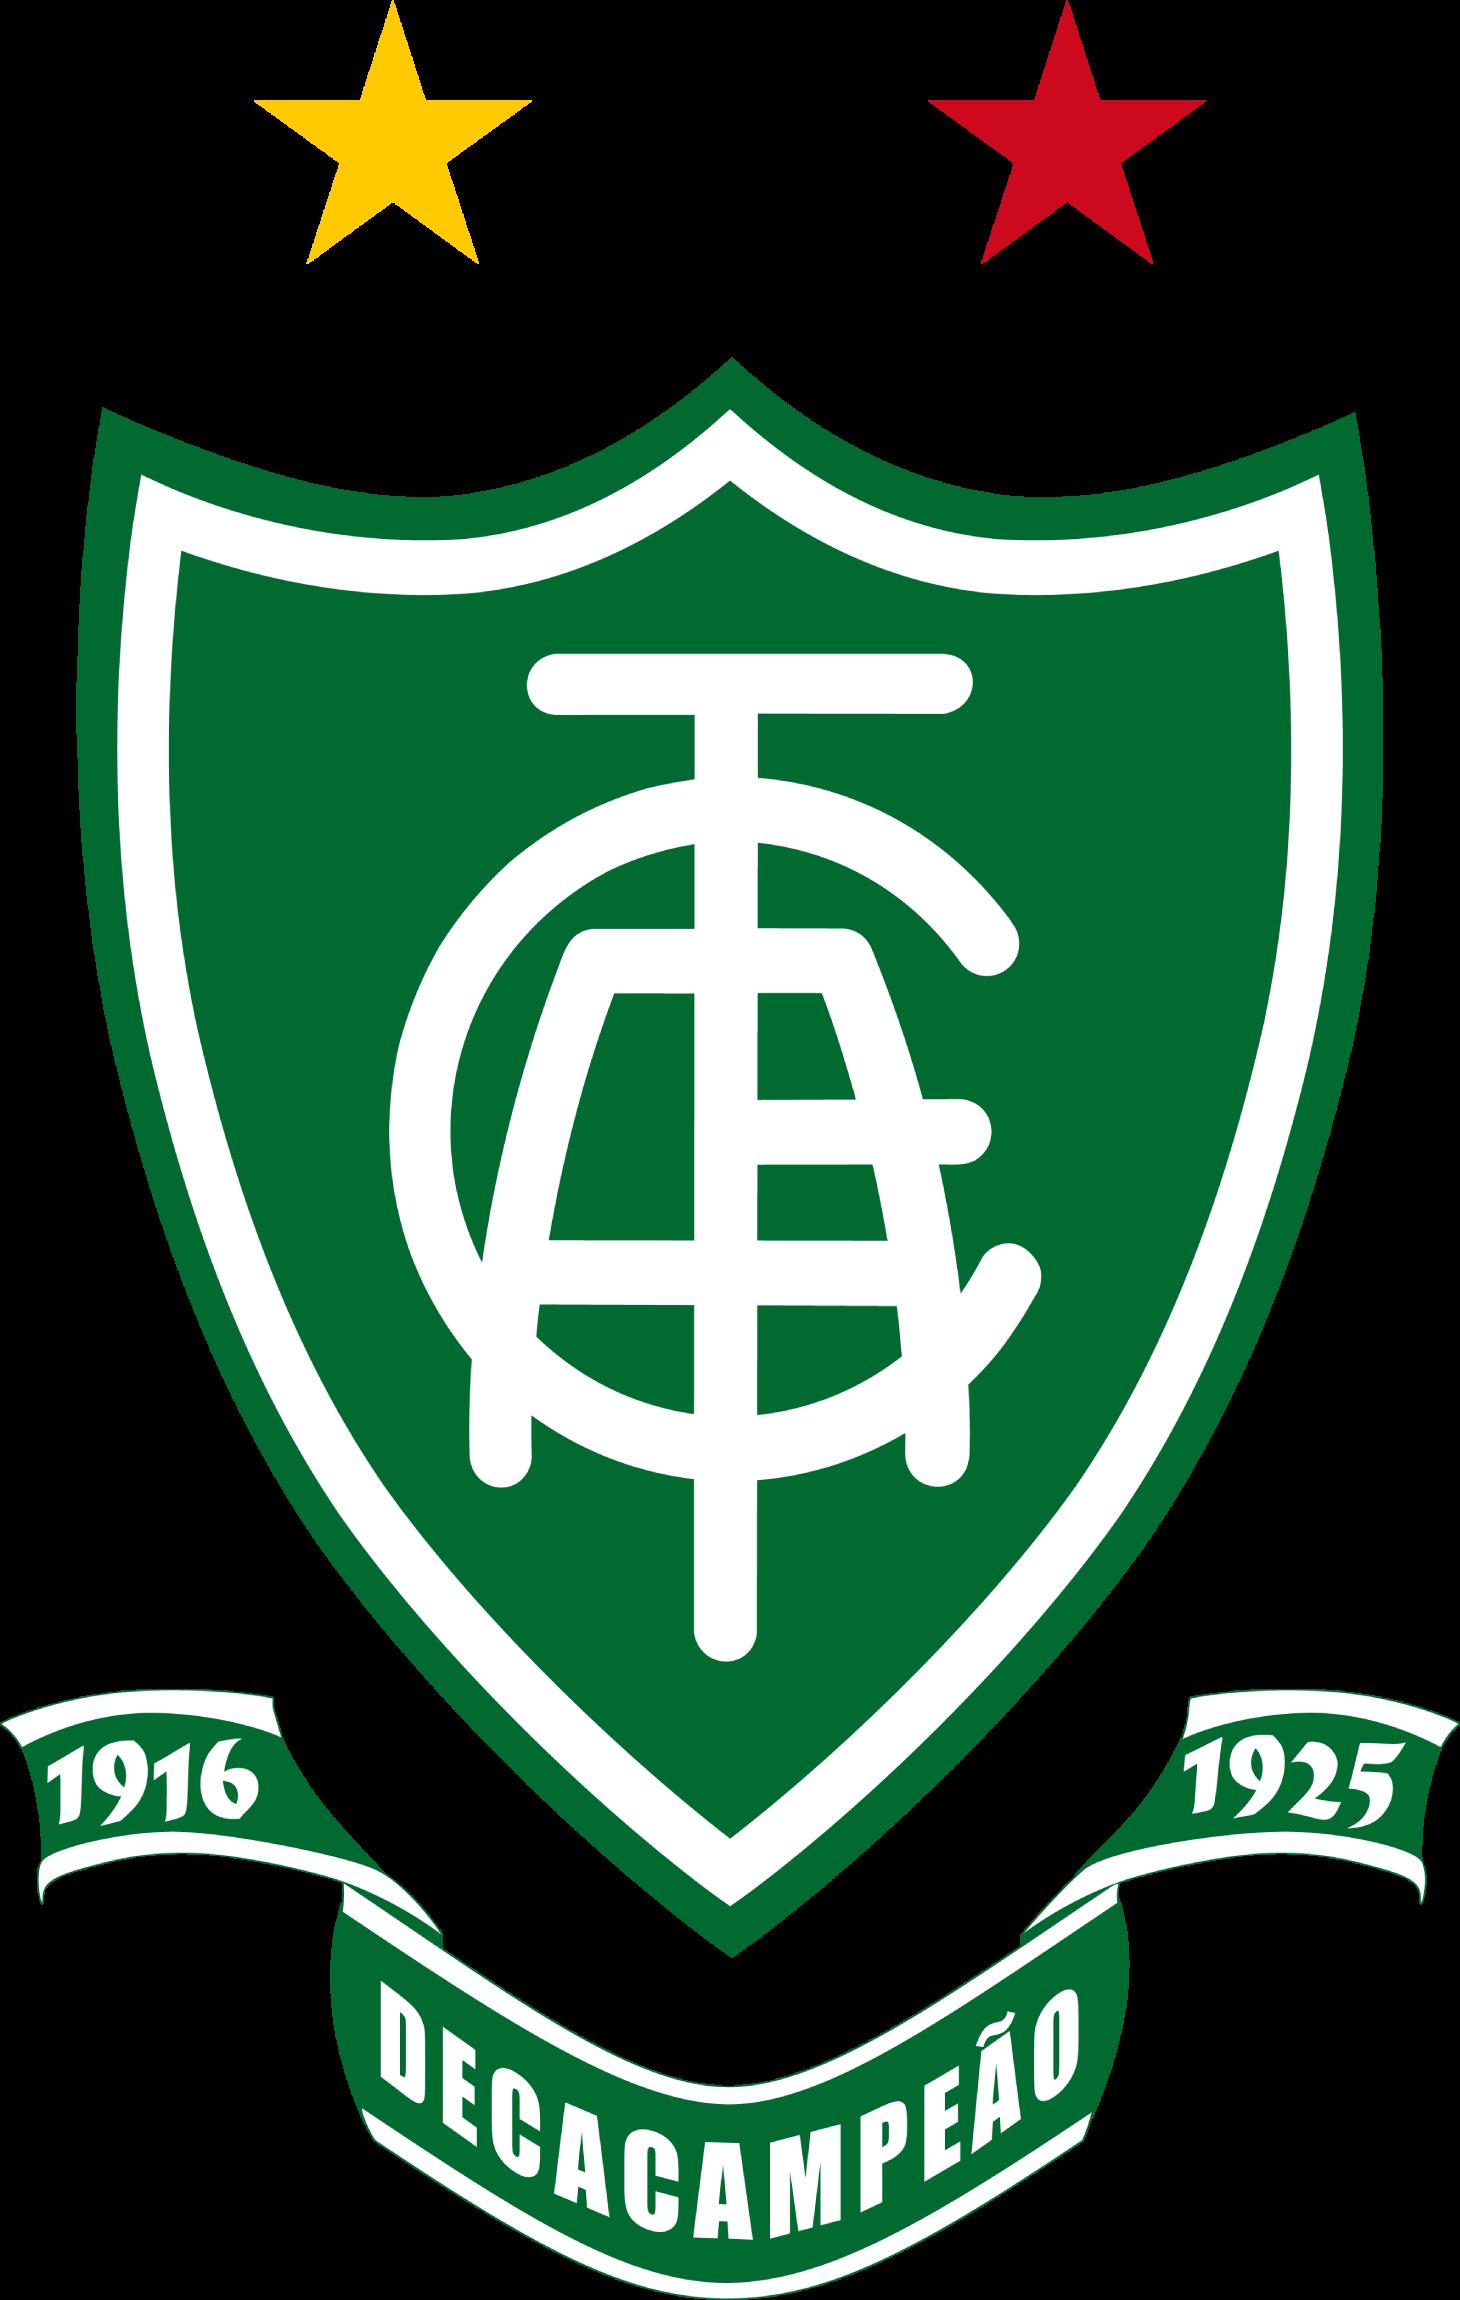 América Futebol Clube América futebol clube, Futebol